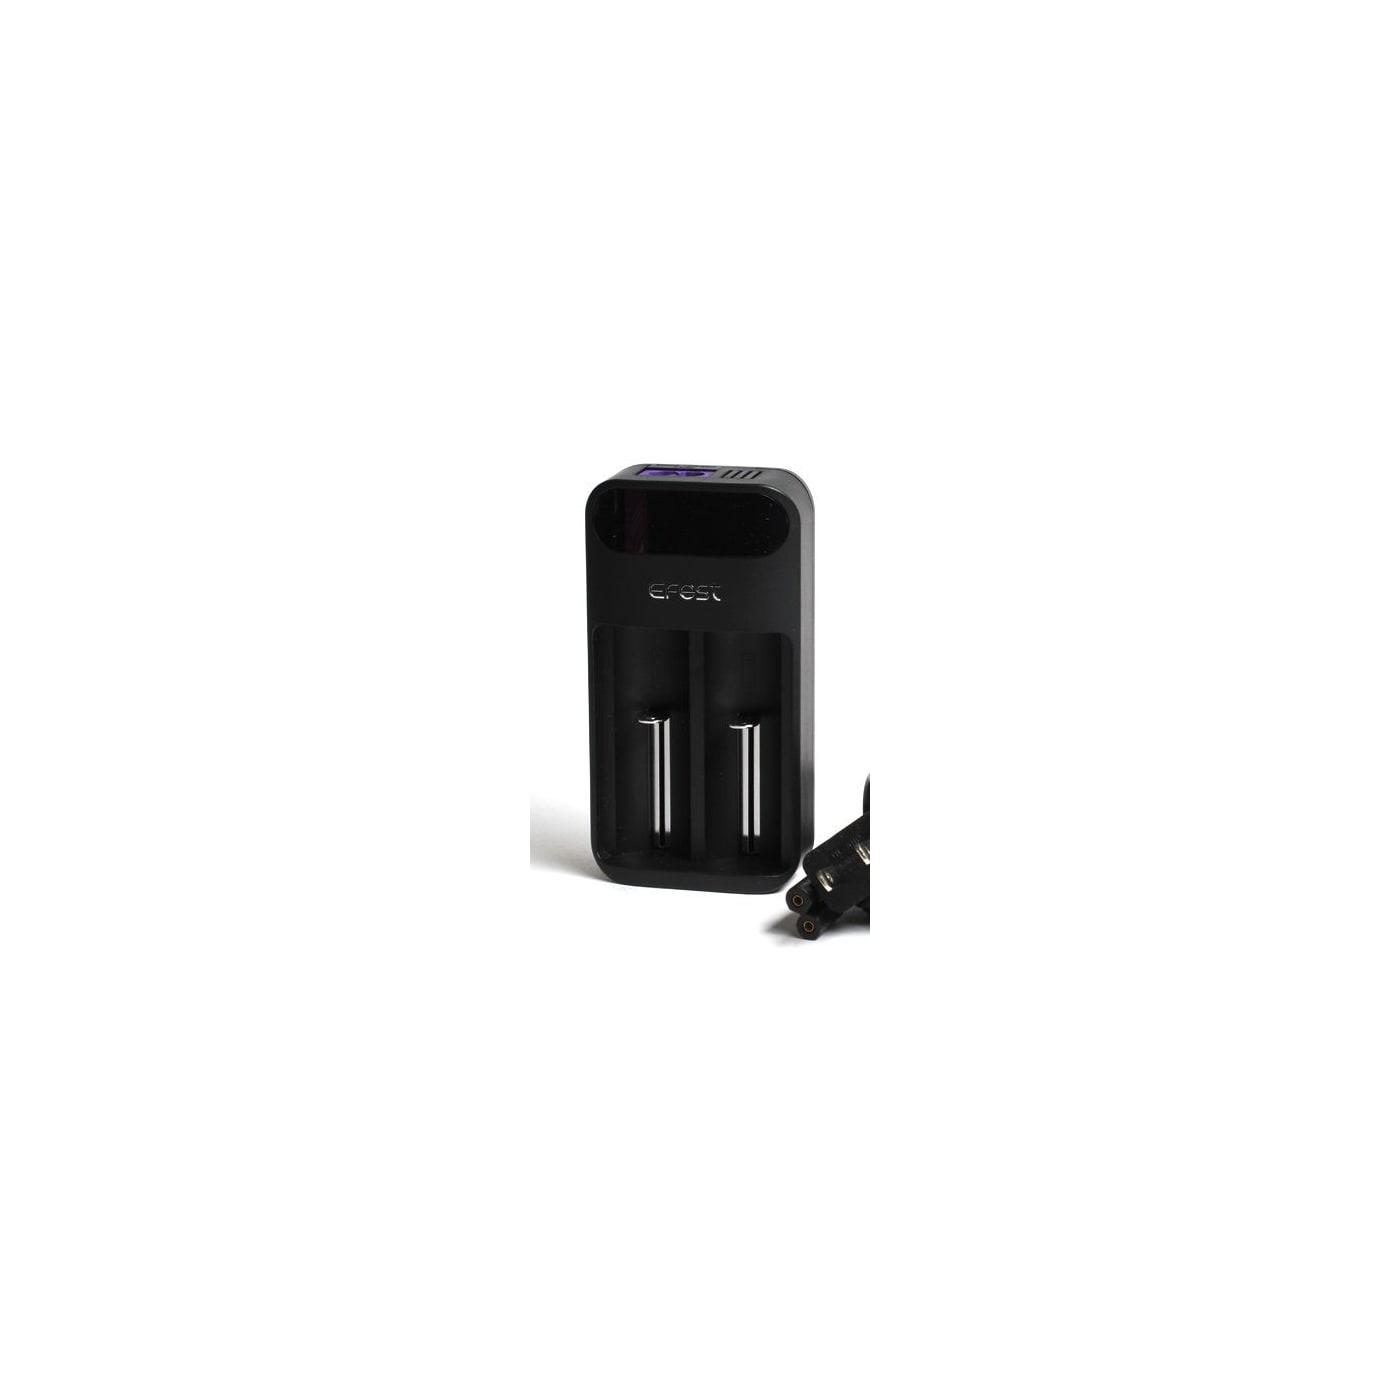 Efest LUSH Q2 Intelligent LED Battery Charger